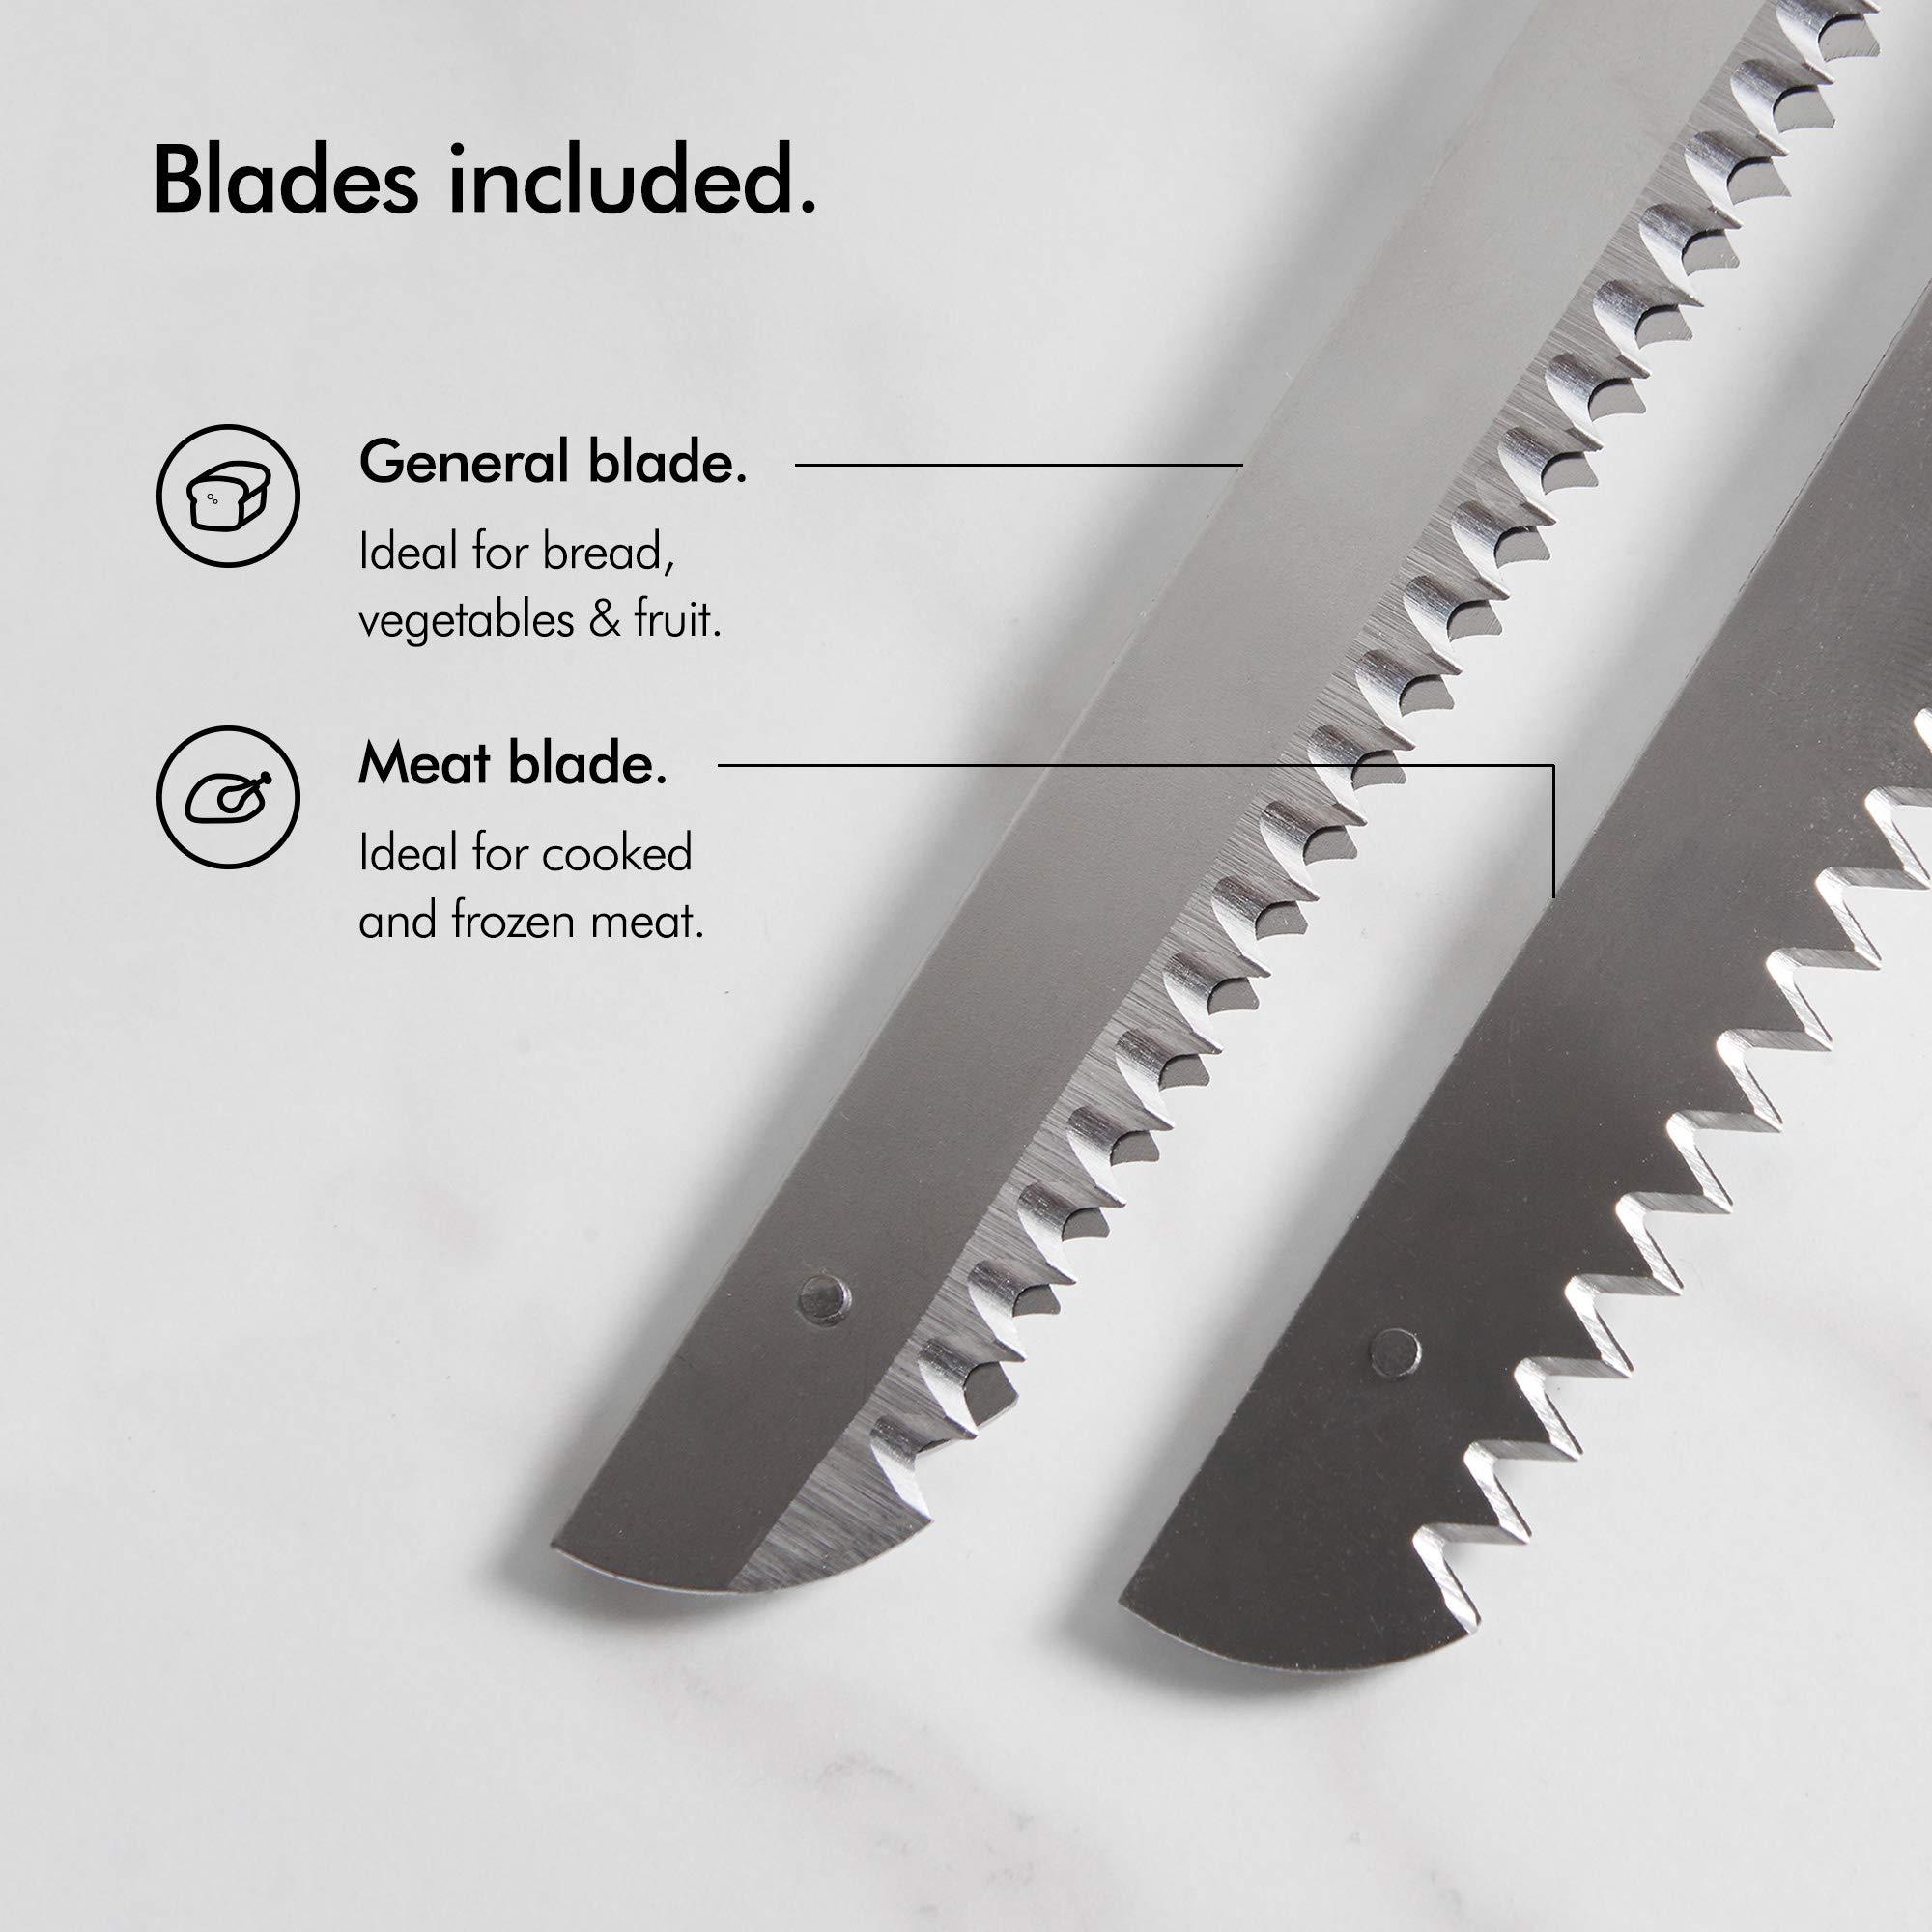 Turkey Carving Knife: VonShef Electric Knife 10 Inch